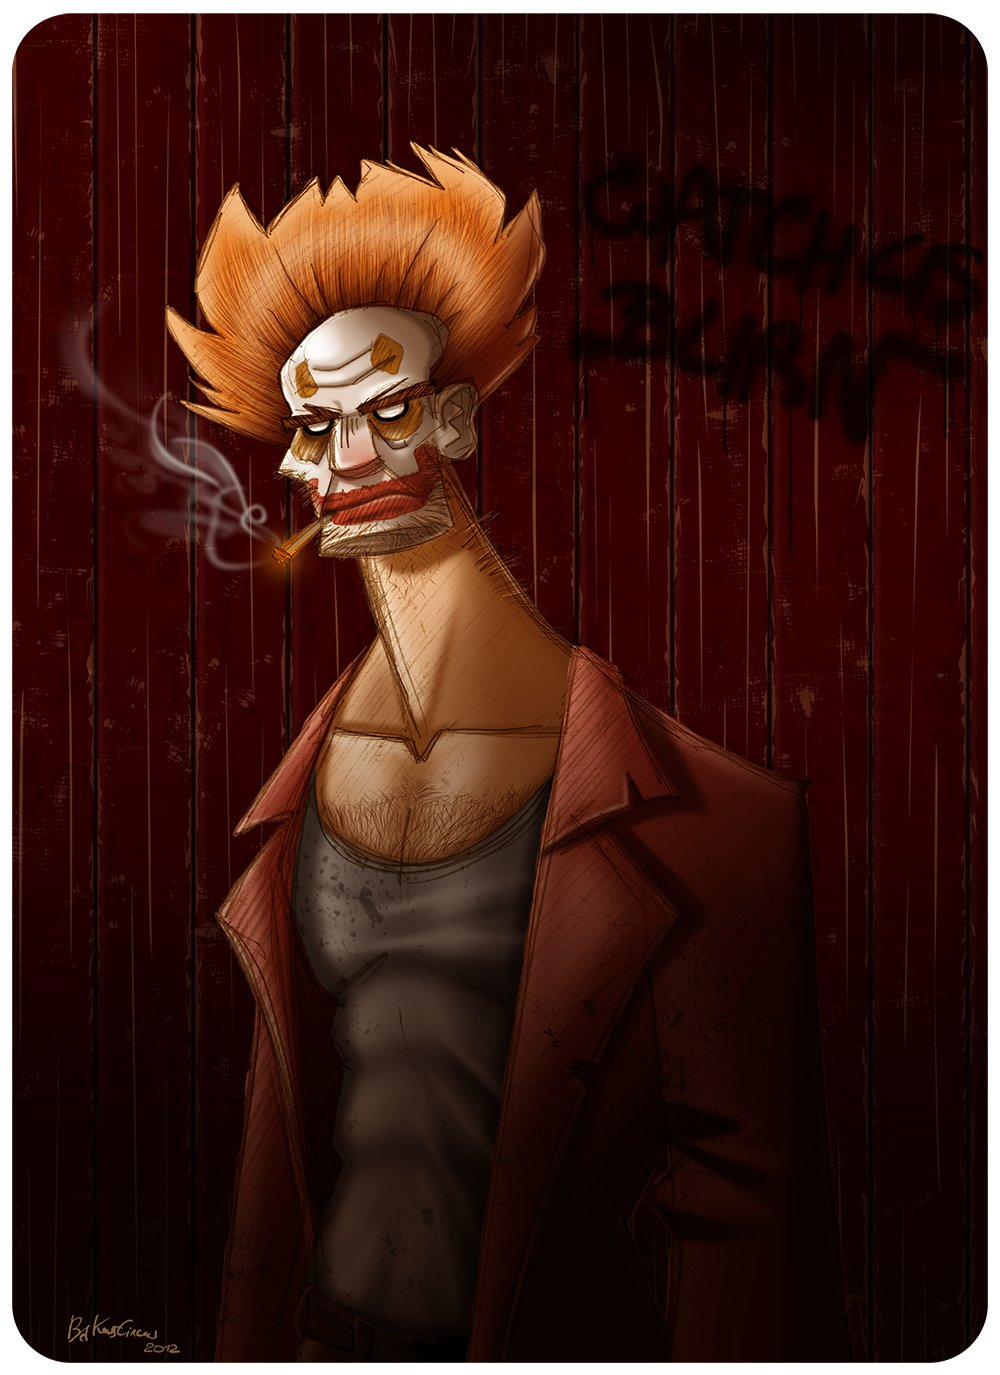 Quentin prigent hazz cartooned web